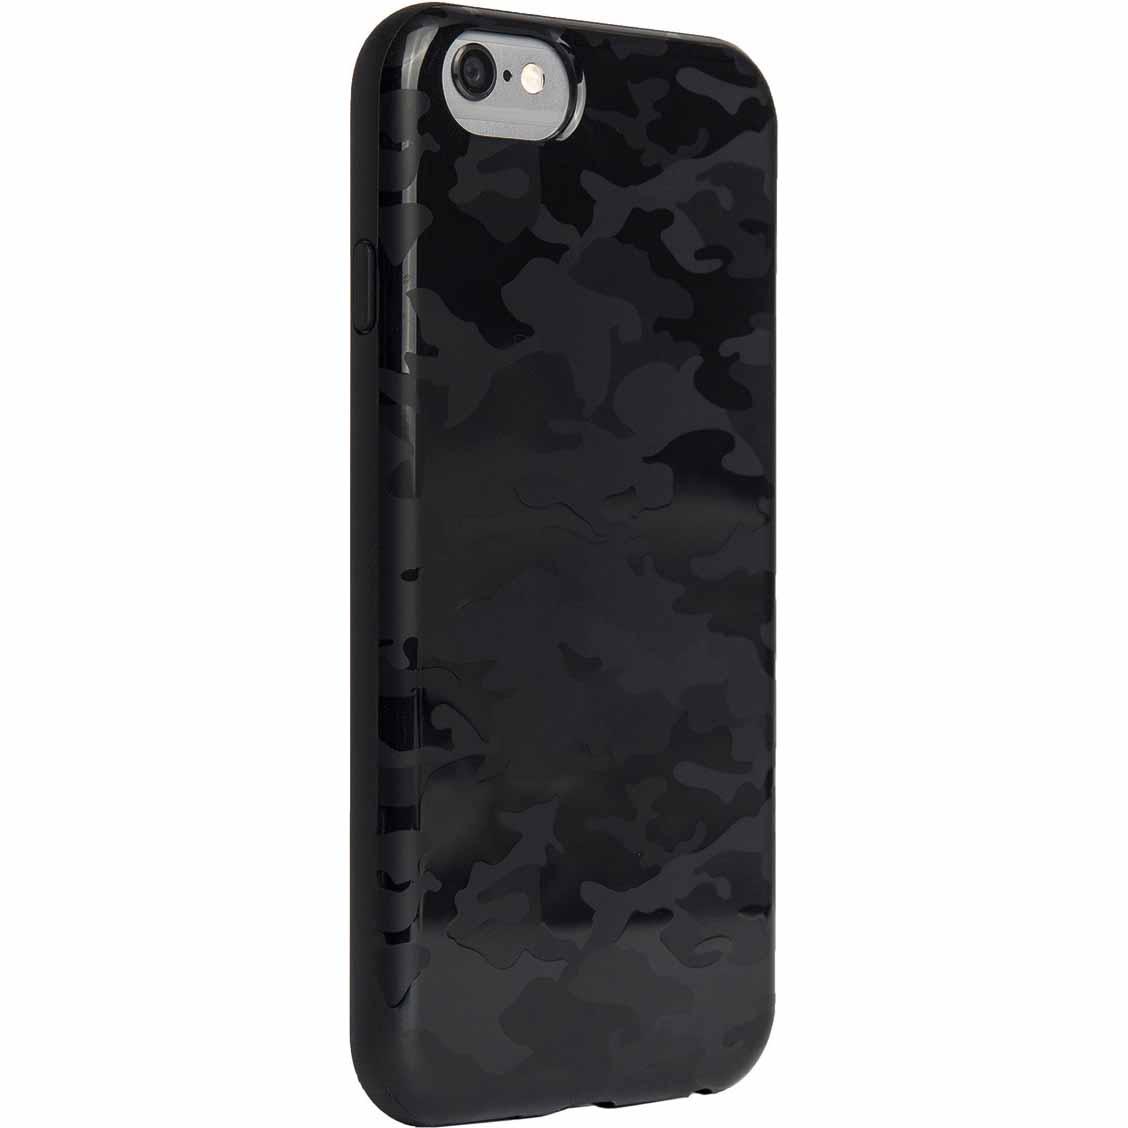 Agent 18 FlexShield Case for iPhone 6 - Textured Camo